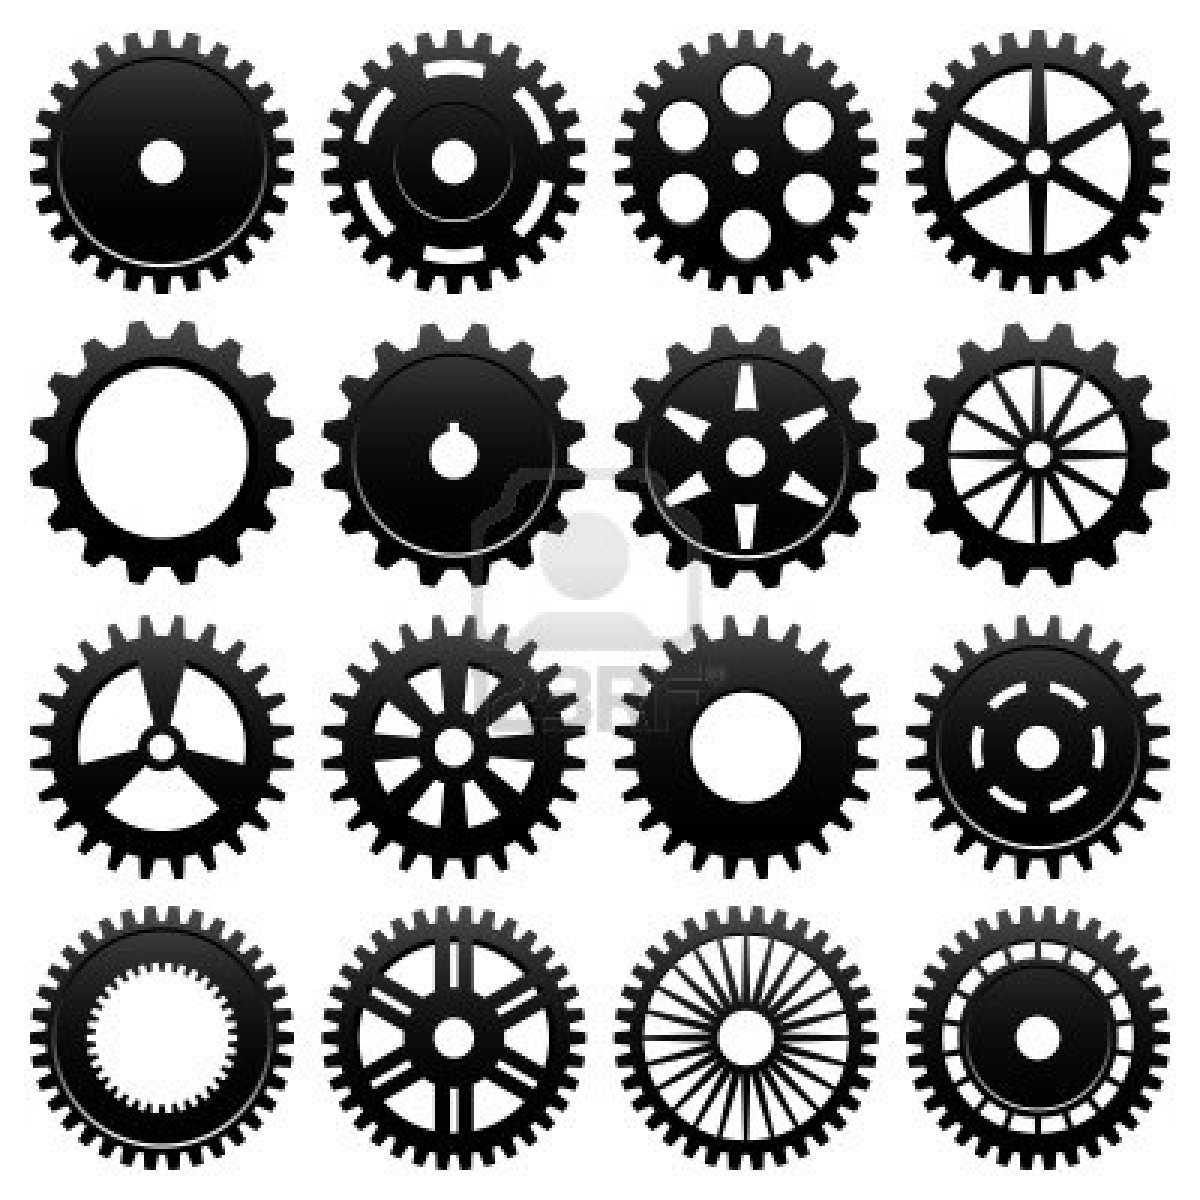 Gears clipart machine gear Image Royalty And Machine Machine